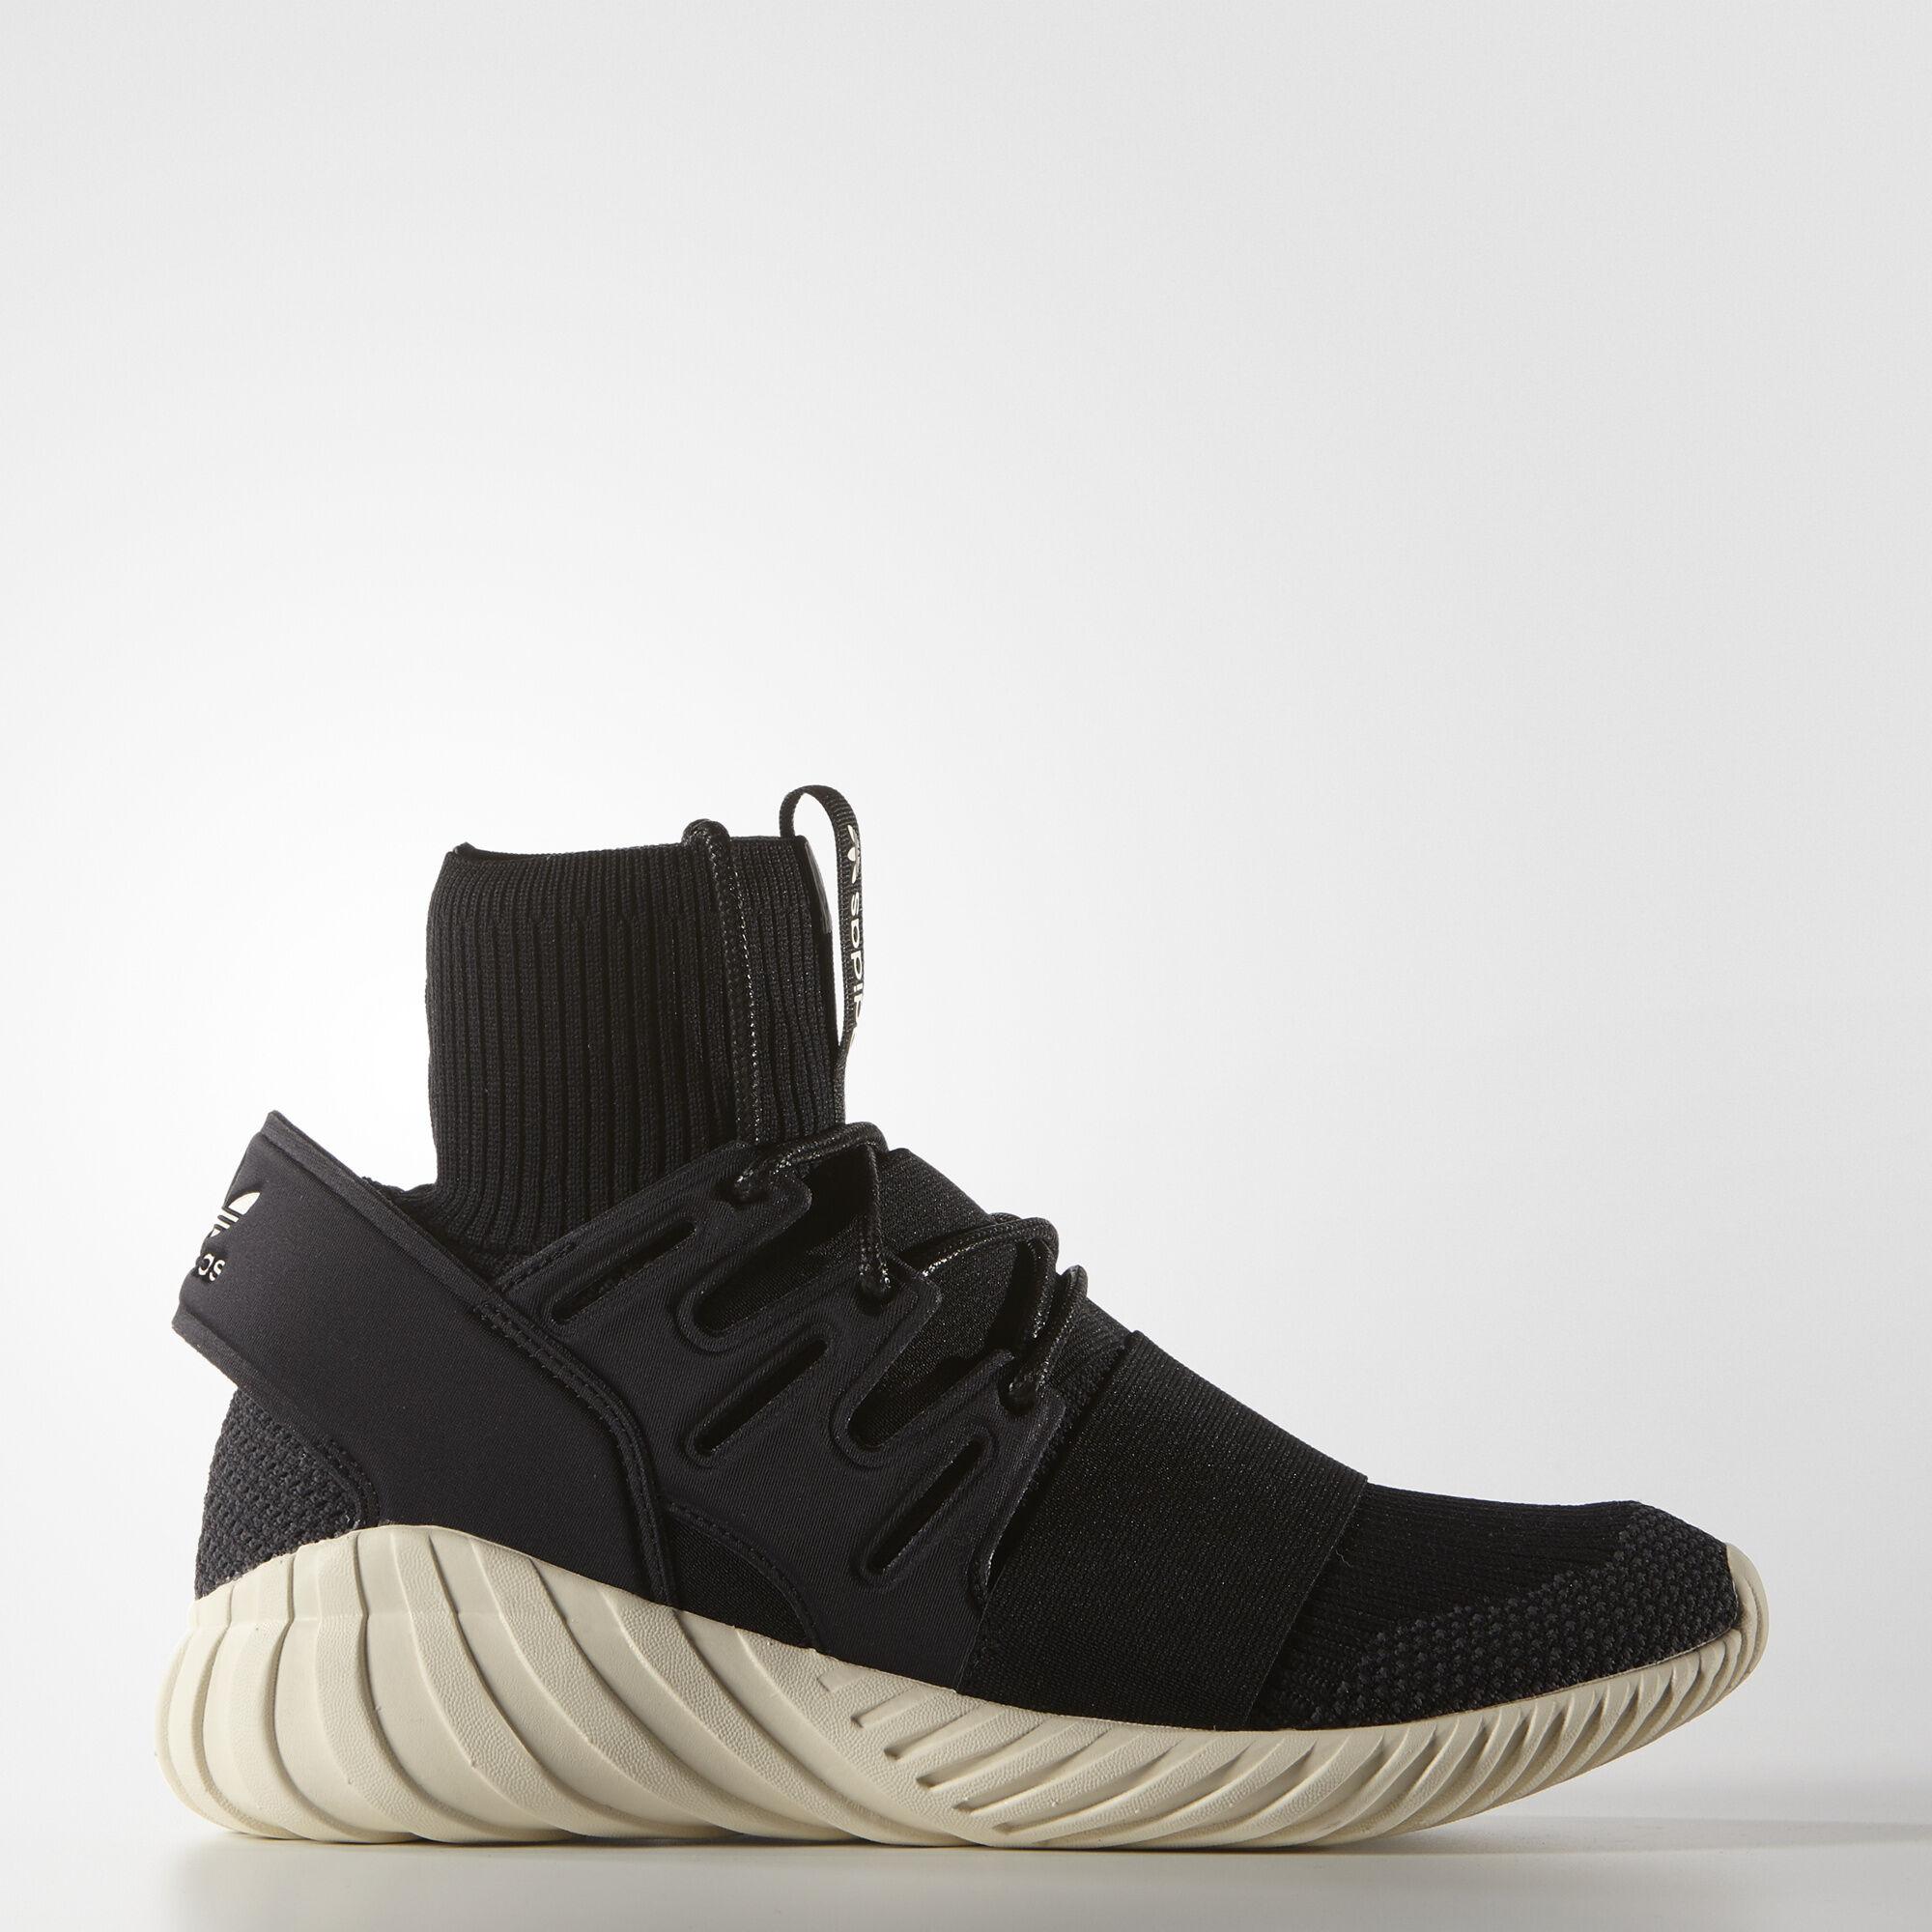 Adidas Tubular Doom Primeknit / Core Black